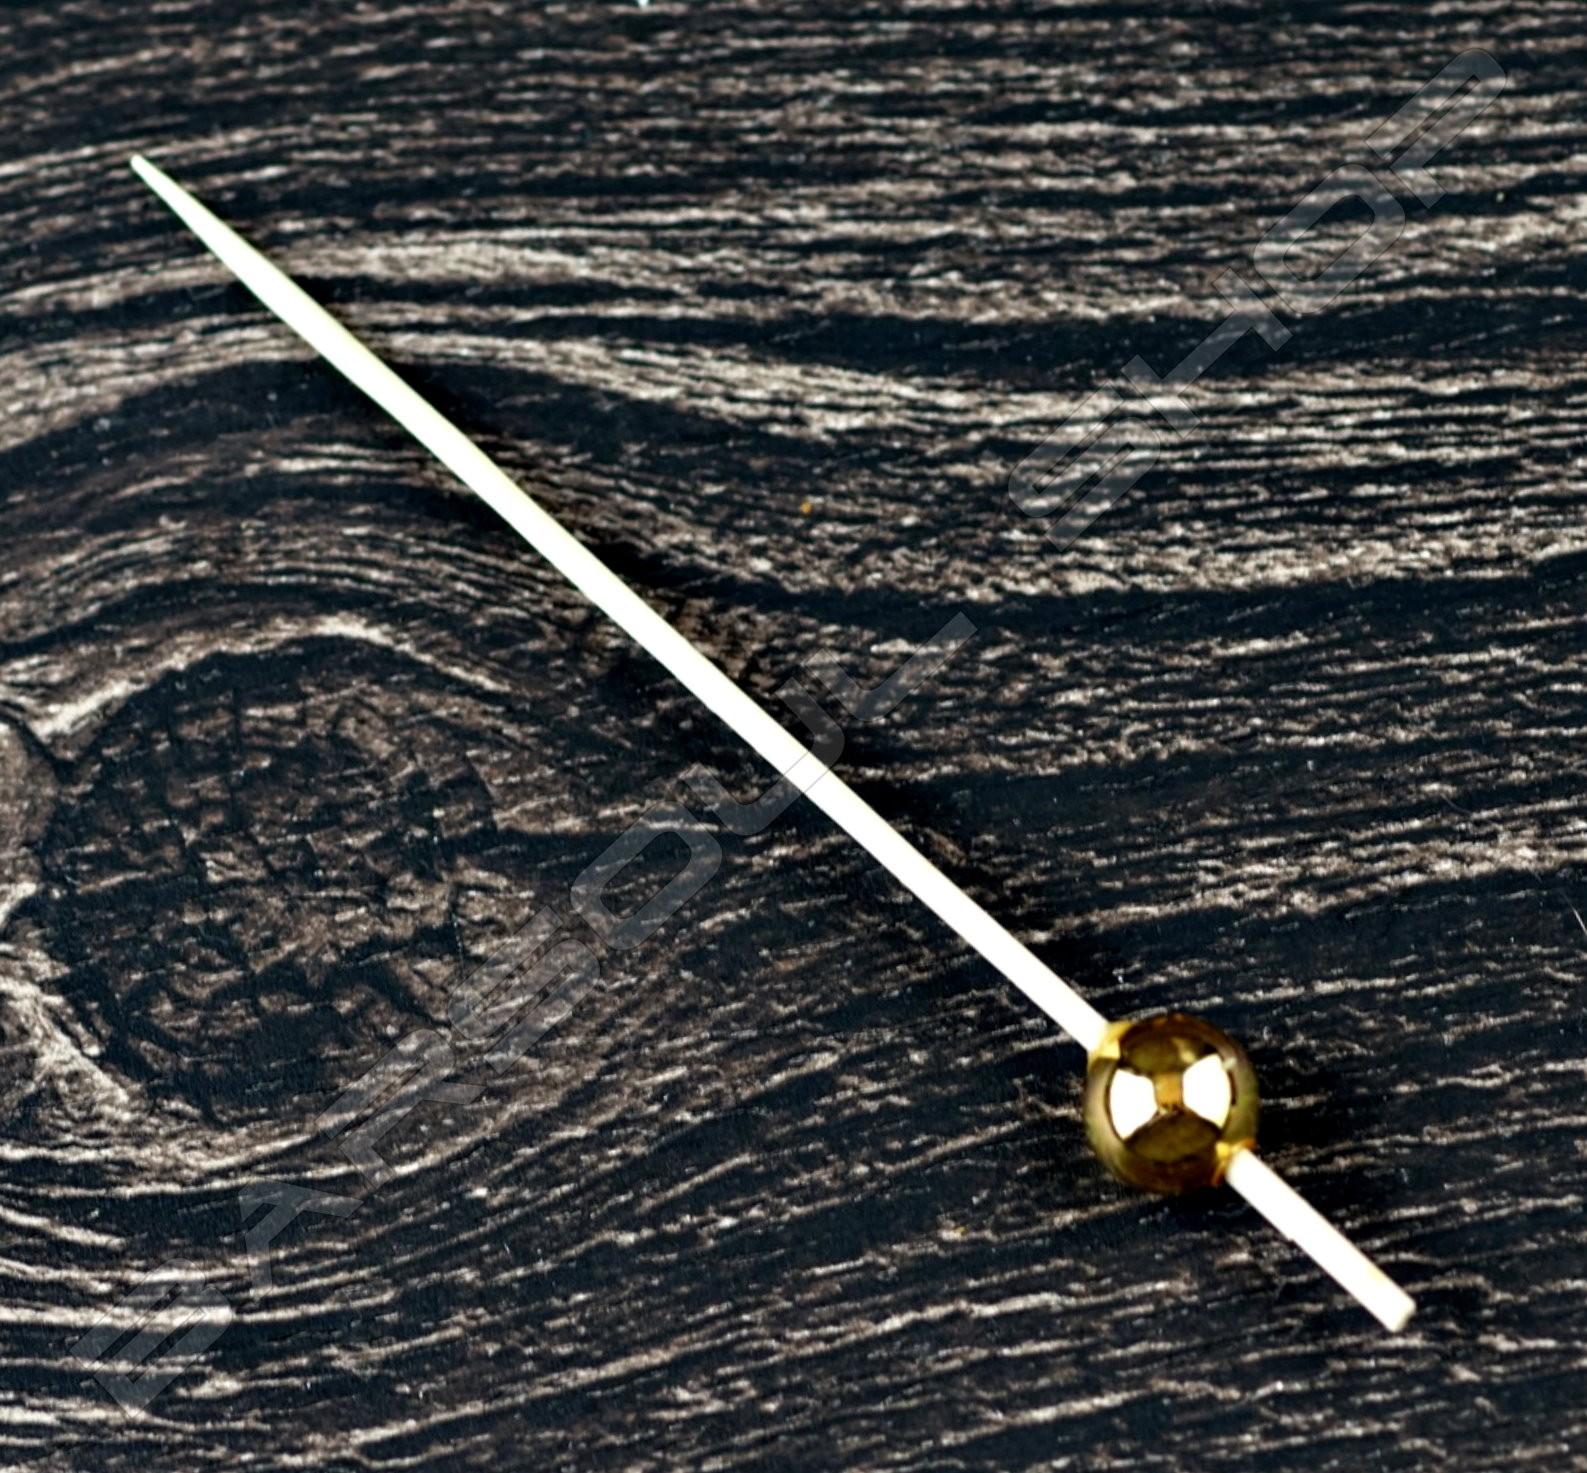 金色光珠裝飾物插(100mm)約100支 Gold  bead cocktail stick